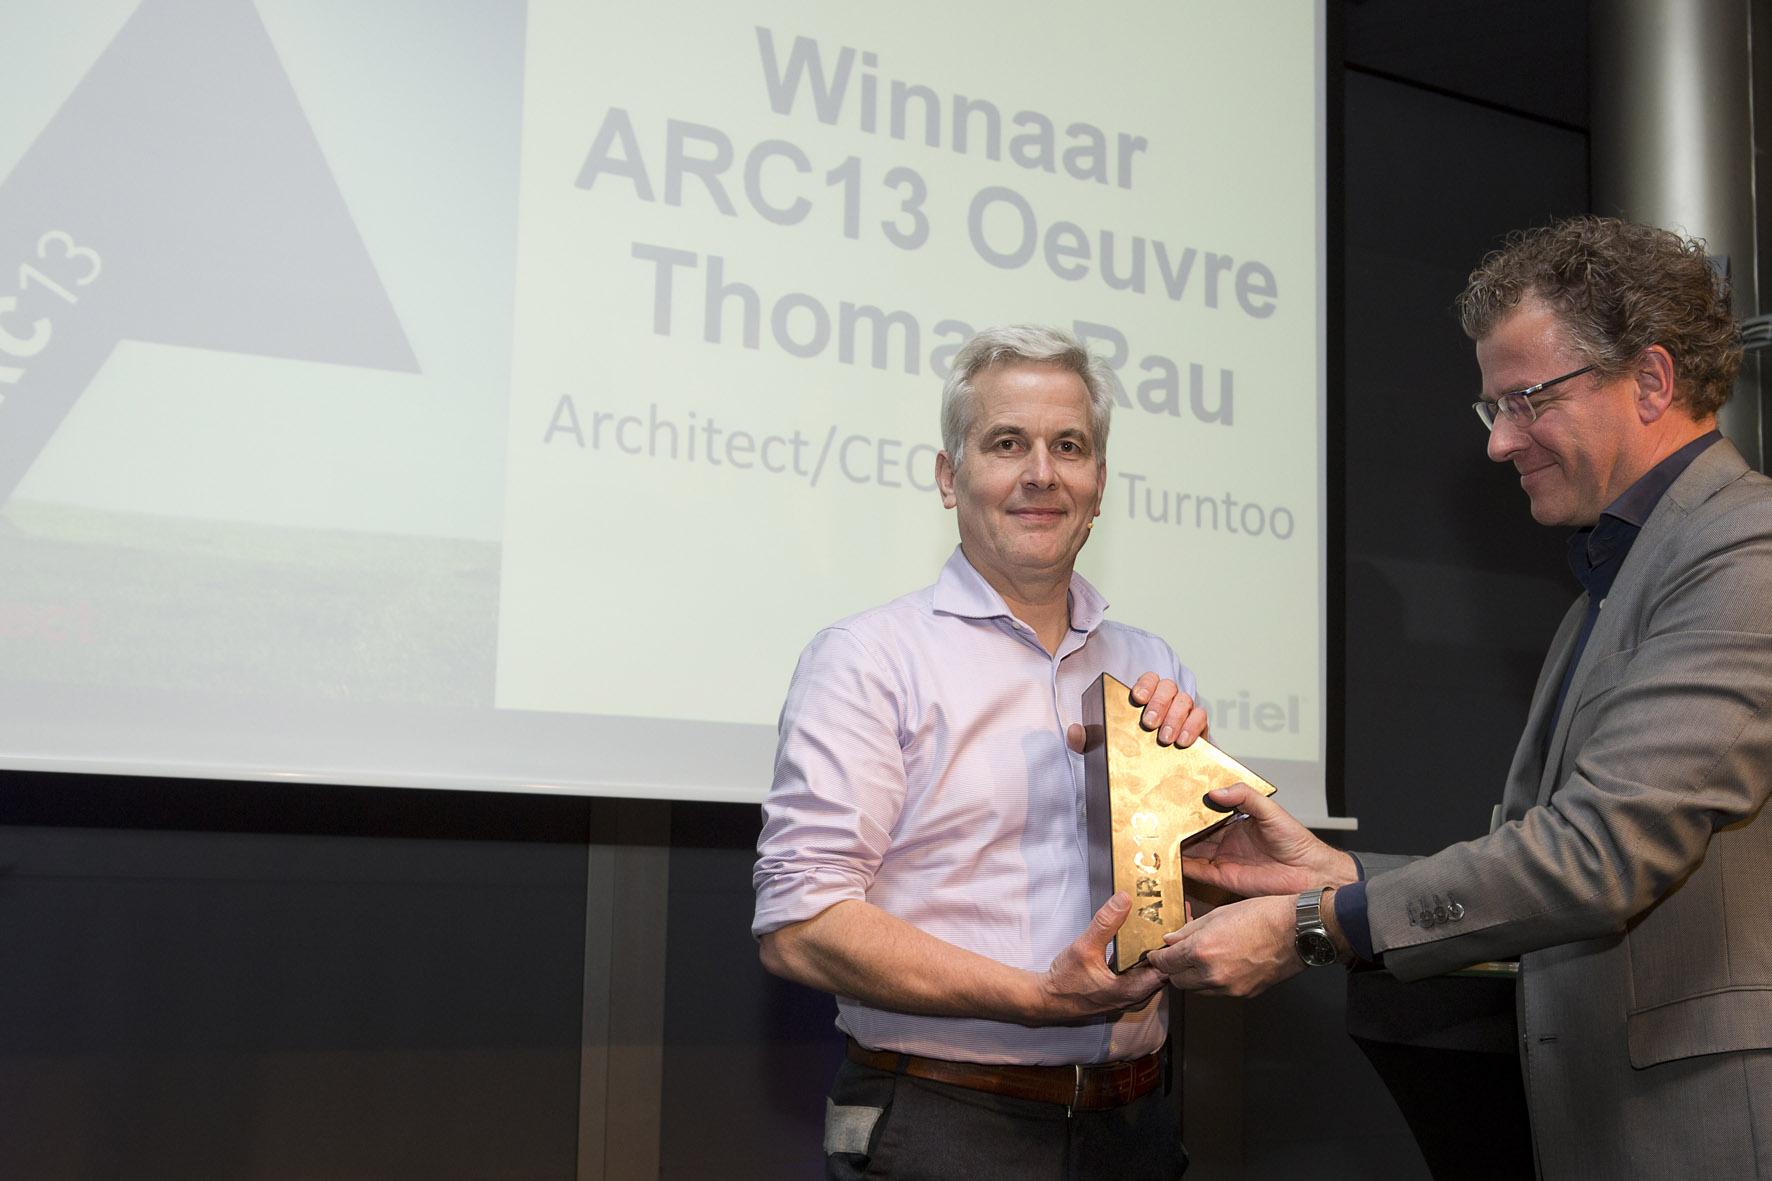 ARC13 Oeuvre naar Thomas Rau